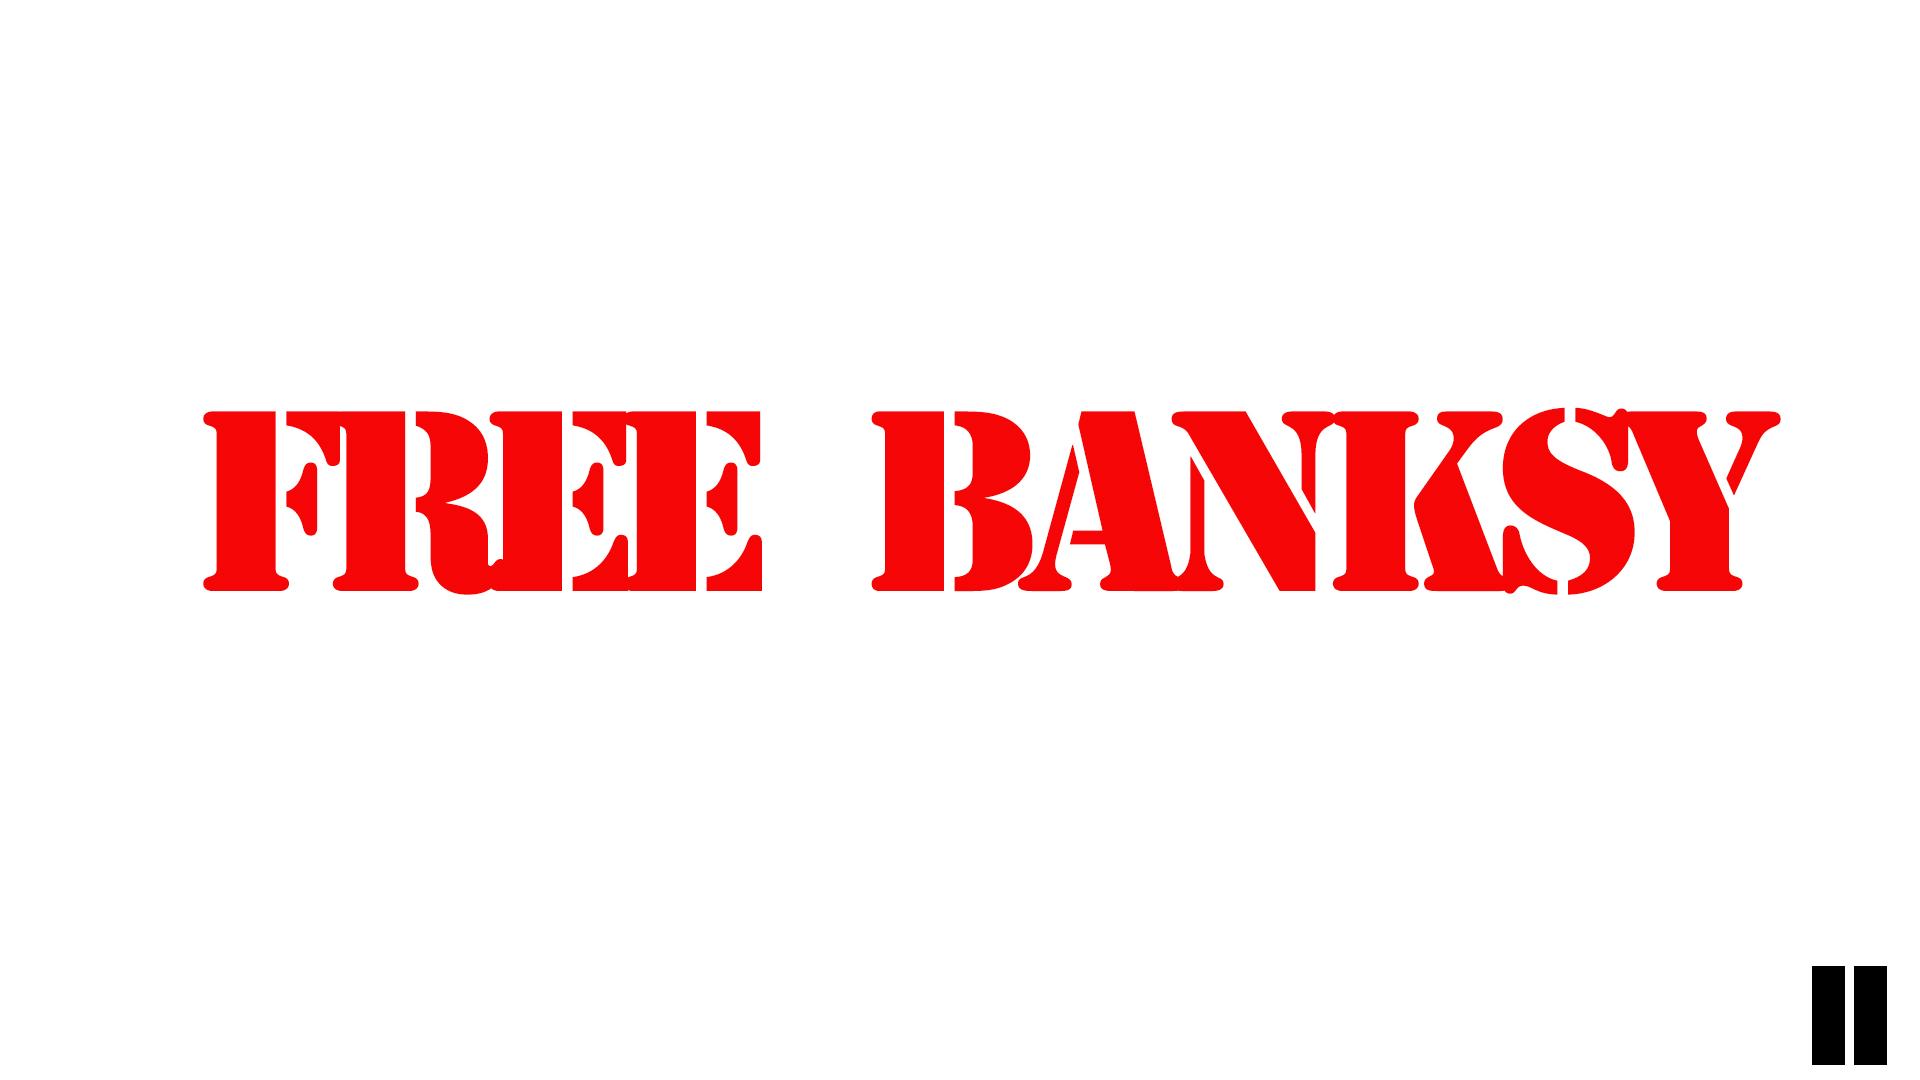 Free Banksy